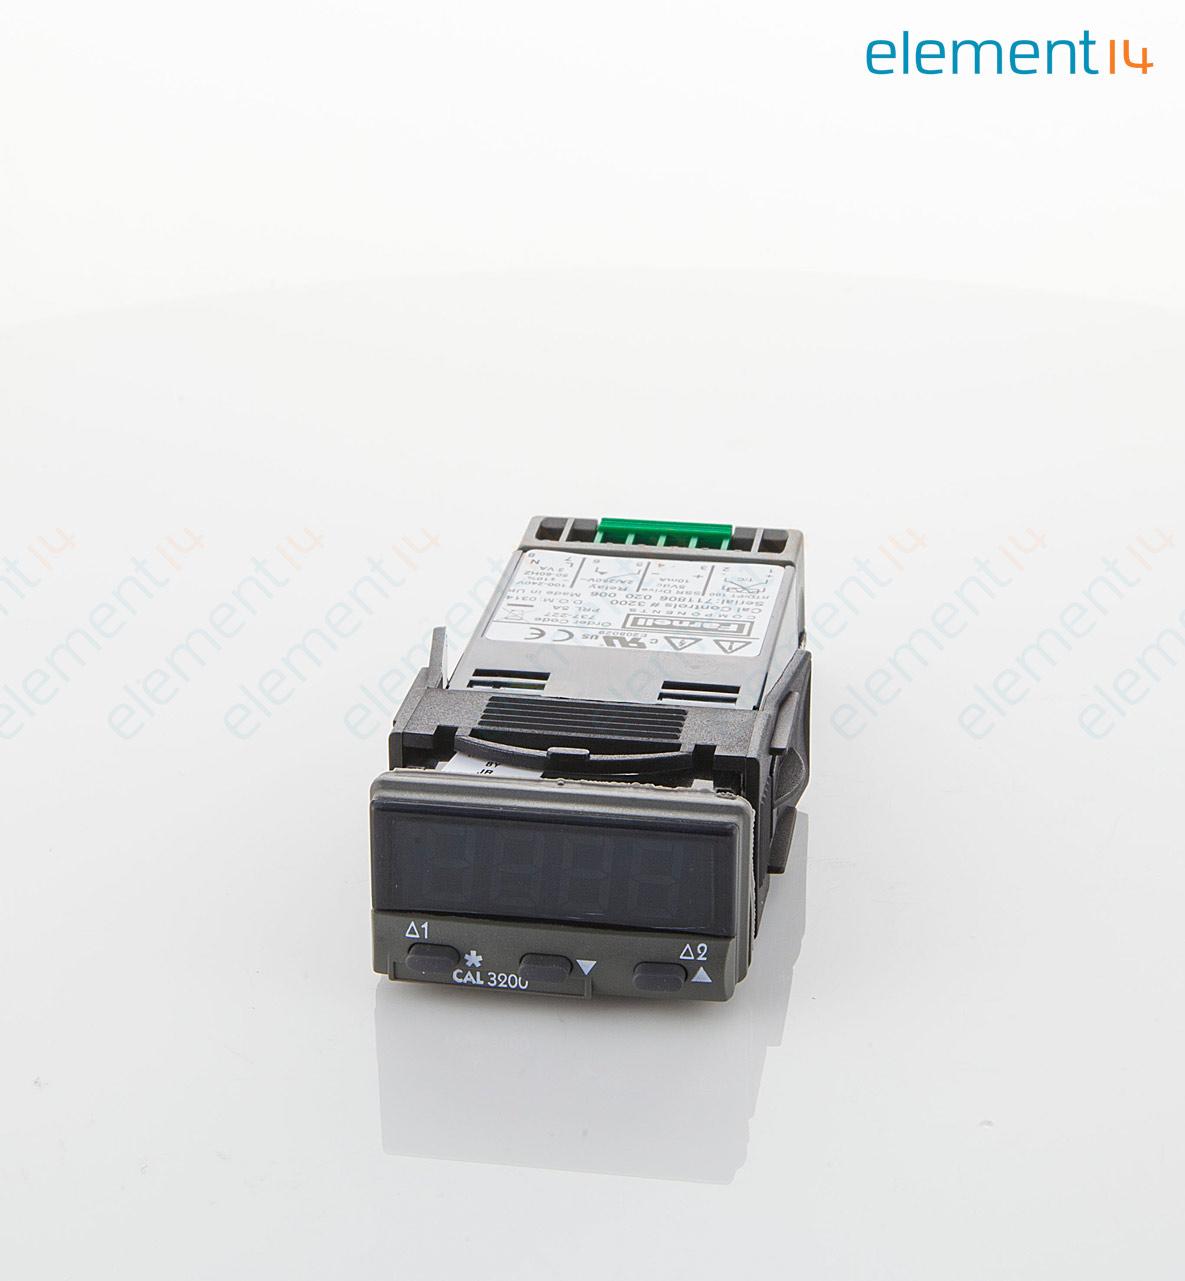 320000 CAL CONTROLS Temperature Controller Model 3200 Autotune 90  #1D8EAE